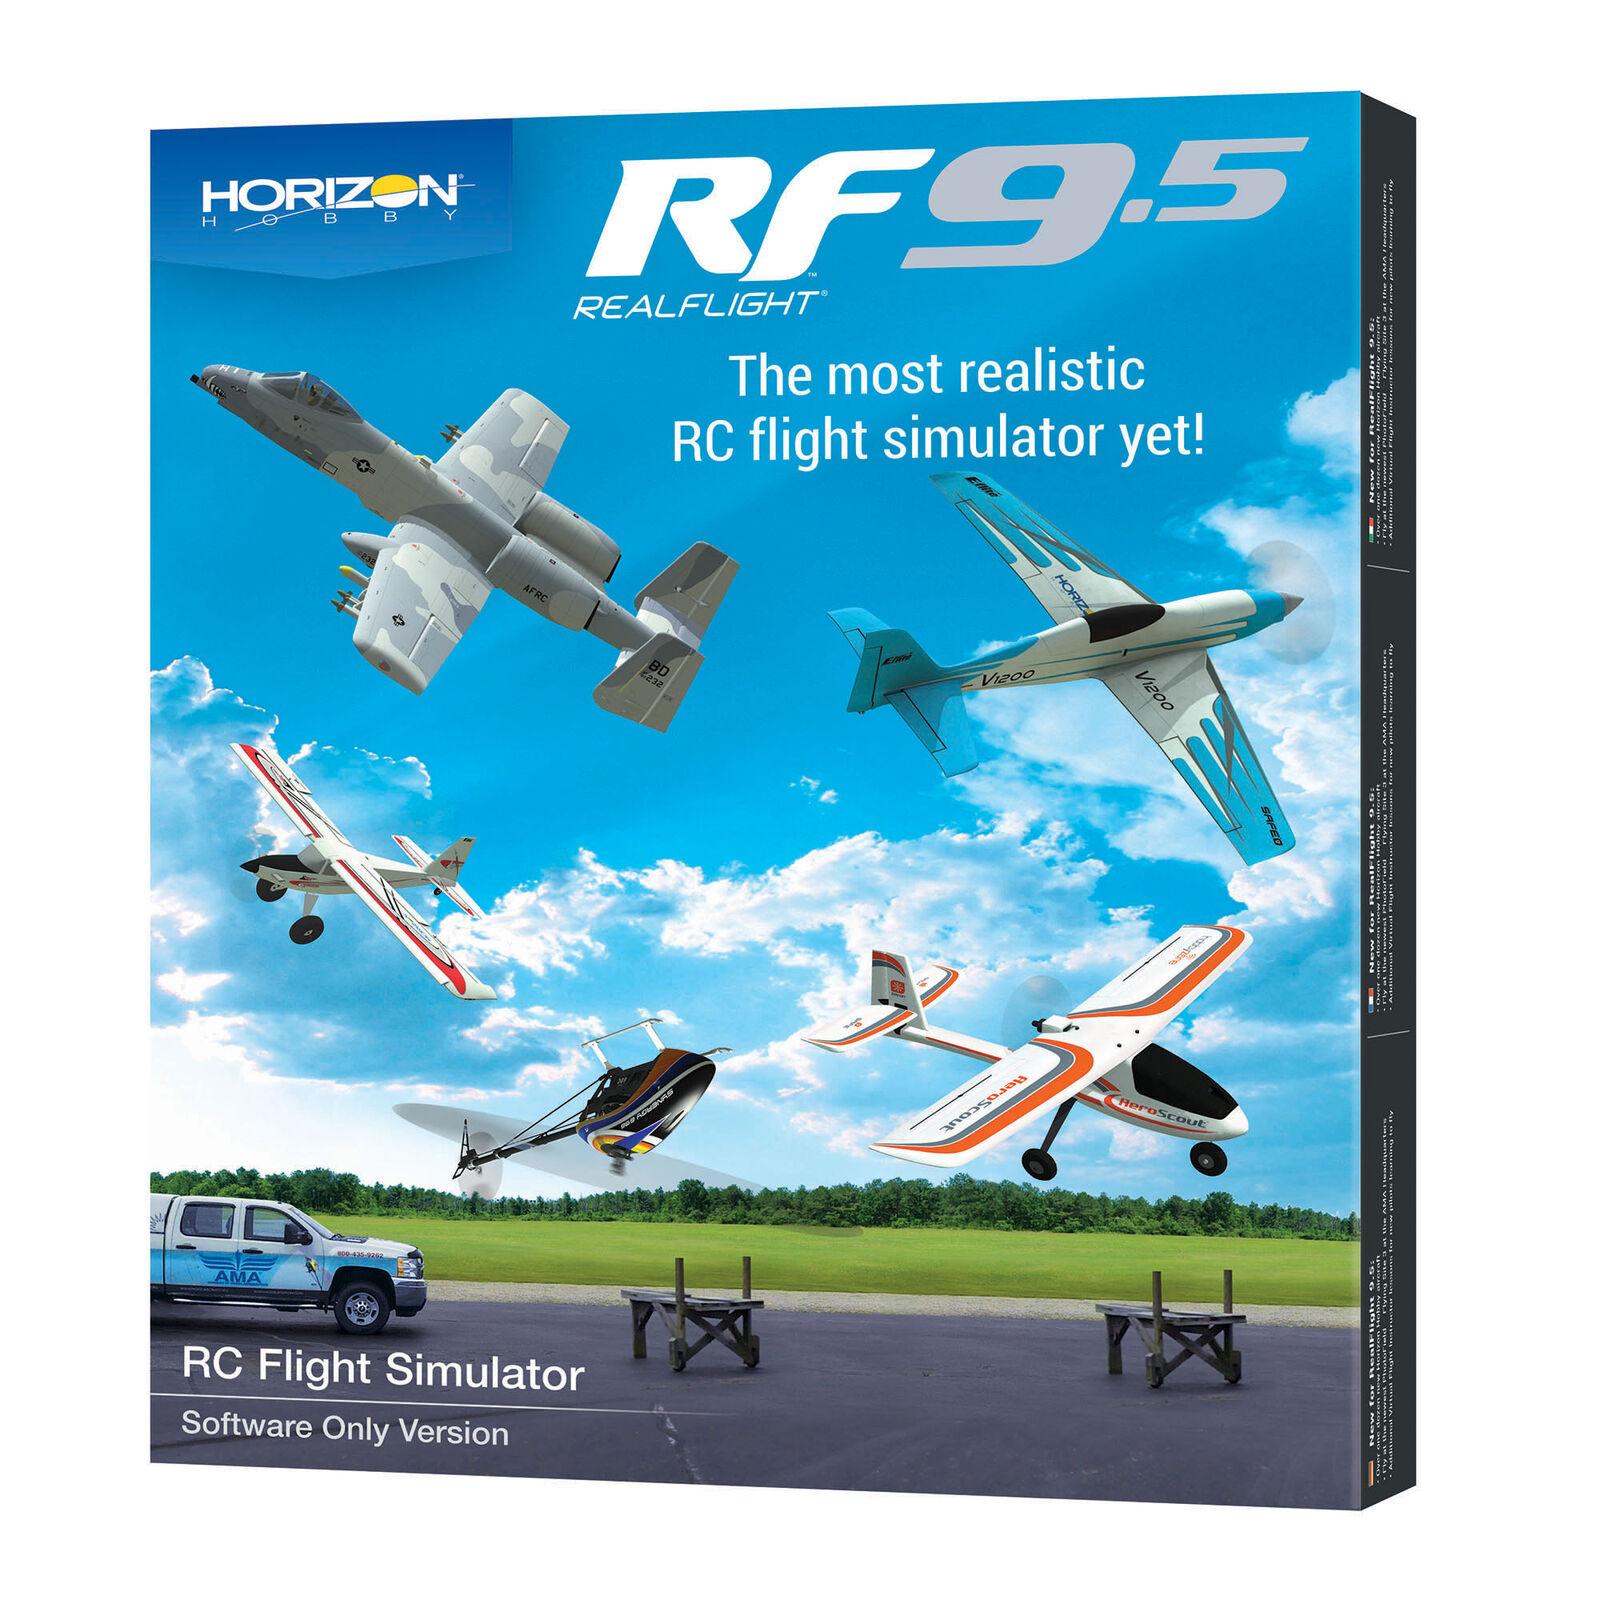 RealFlight 9.5 Flight Simulator, Software Only